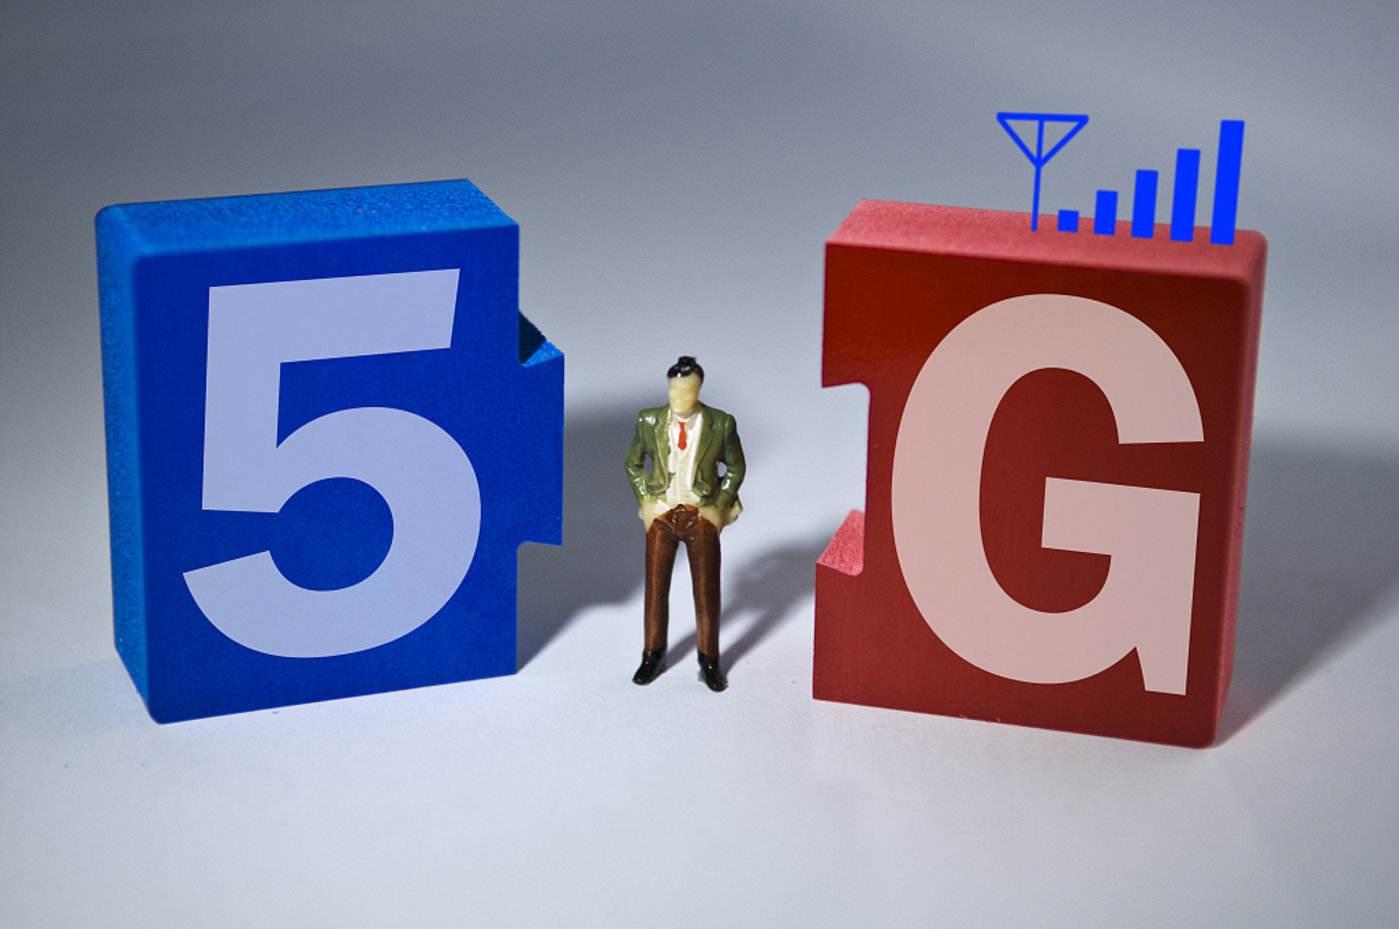 5G频谱底价过高 印度两大运营商拒绝参与拍卖